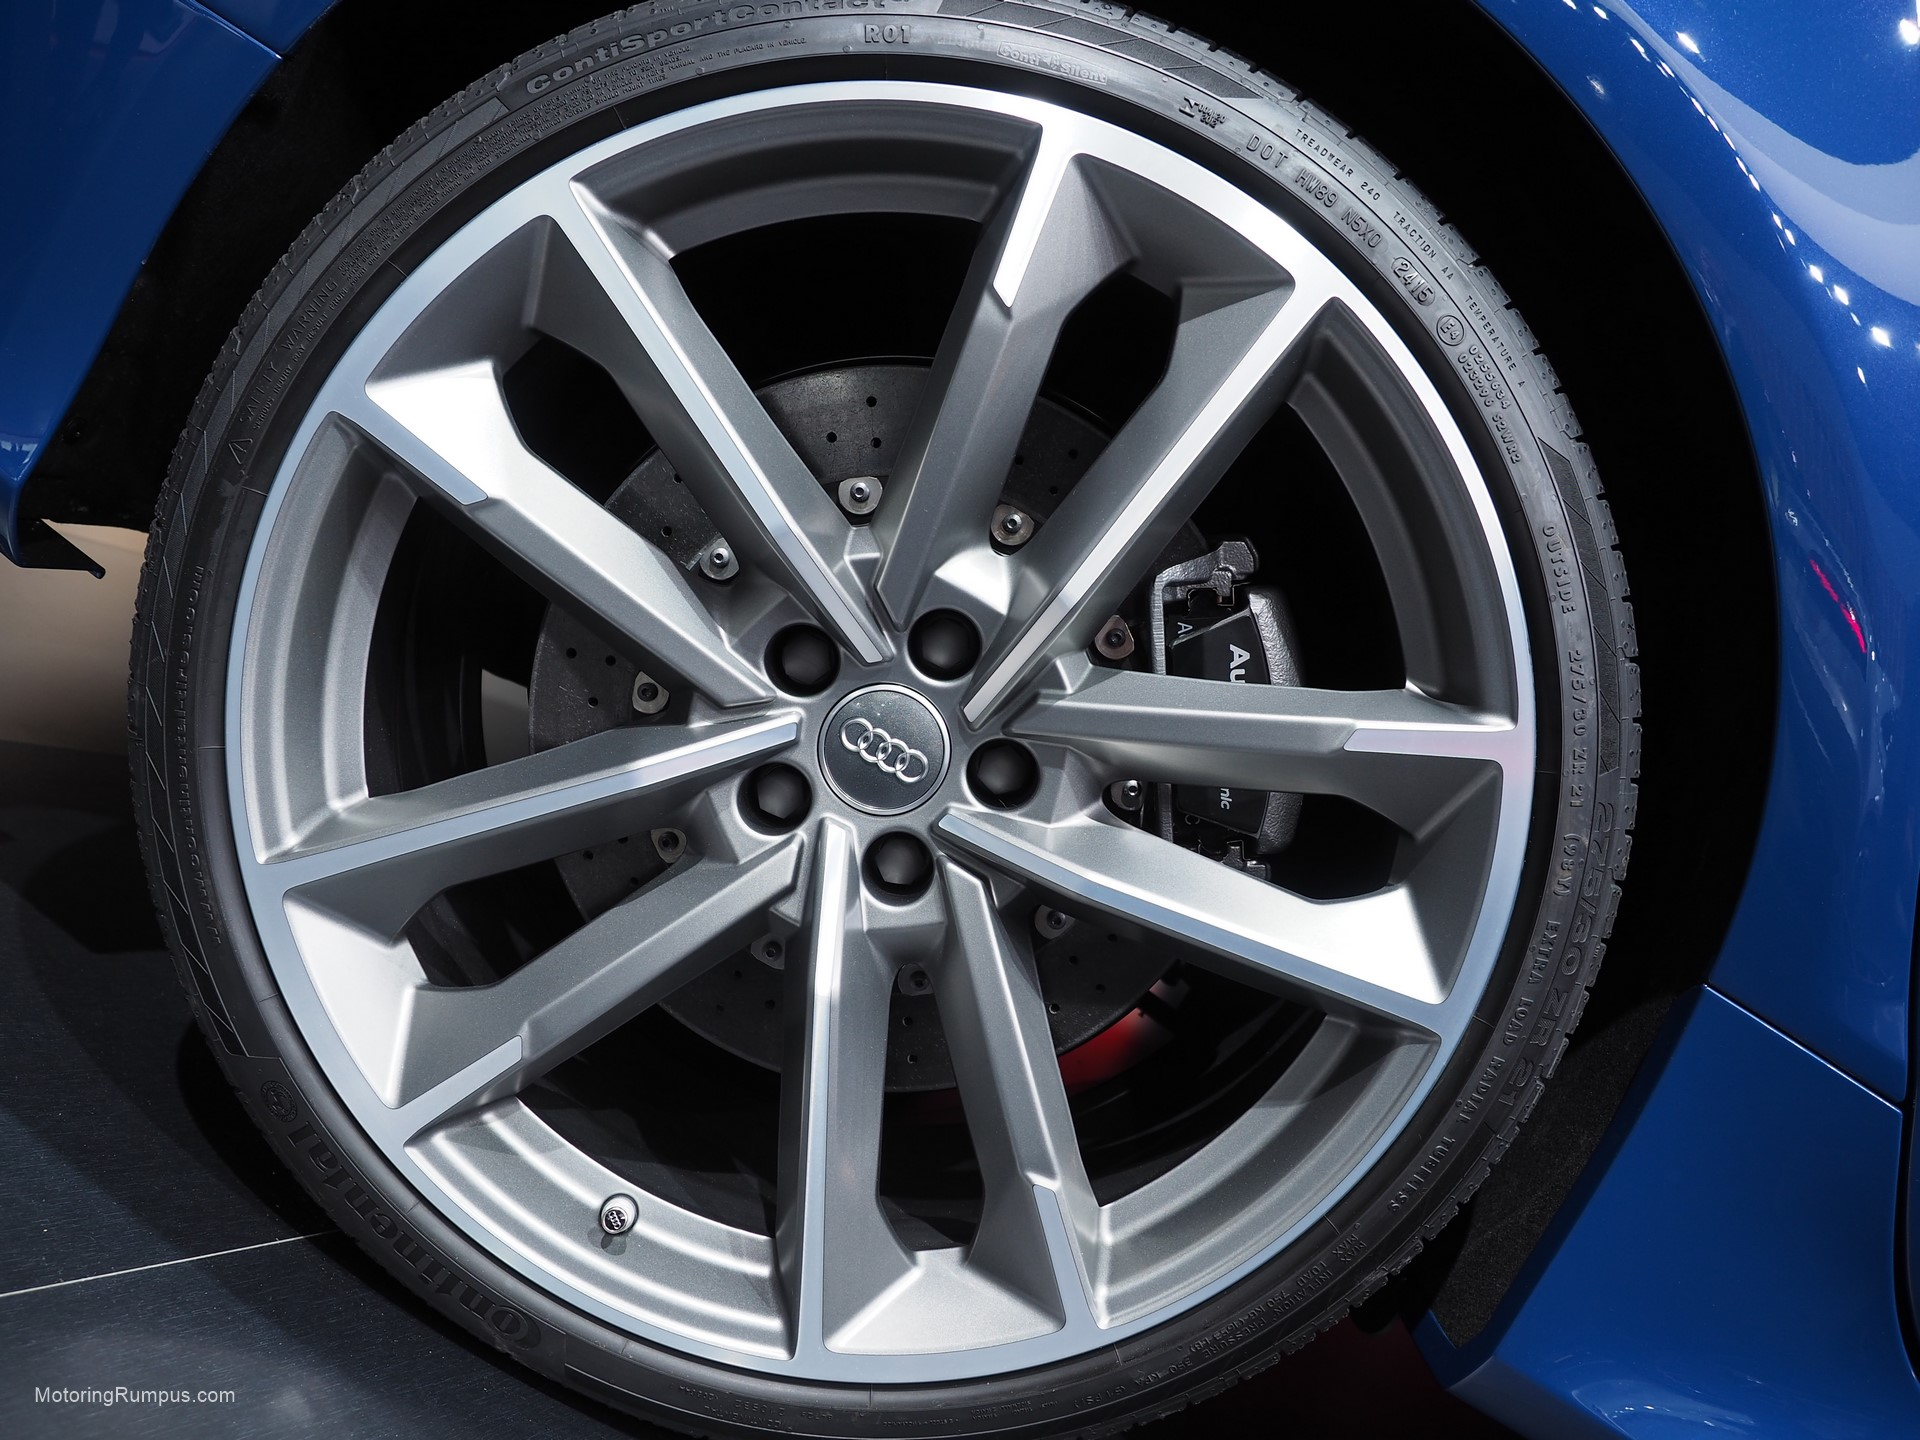 2016 Naias Audi Rs7 21 Inch Wheel Motoring Rumpus